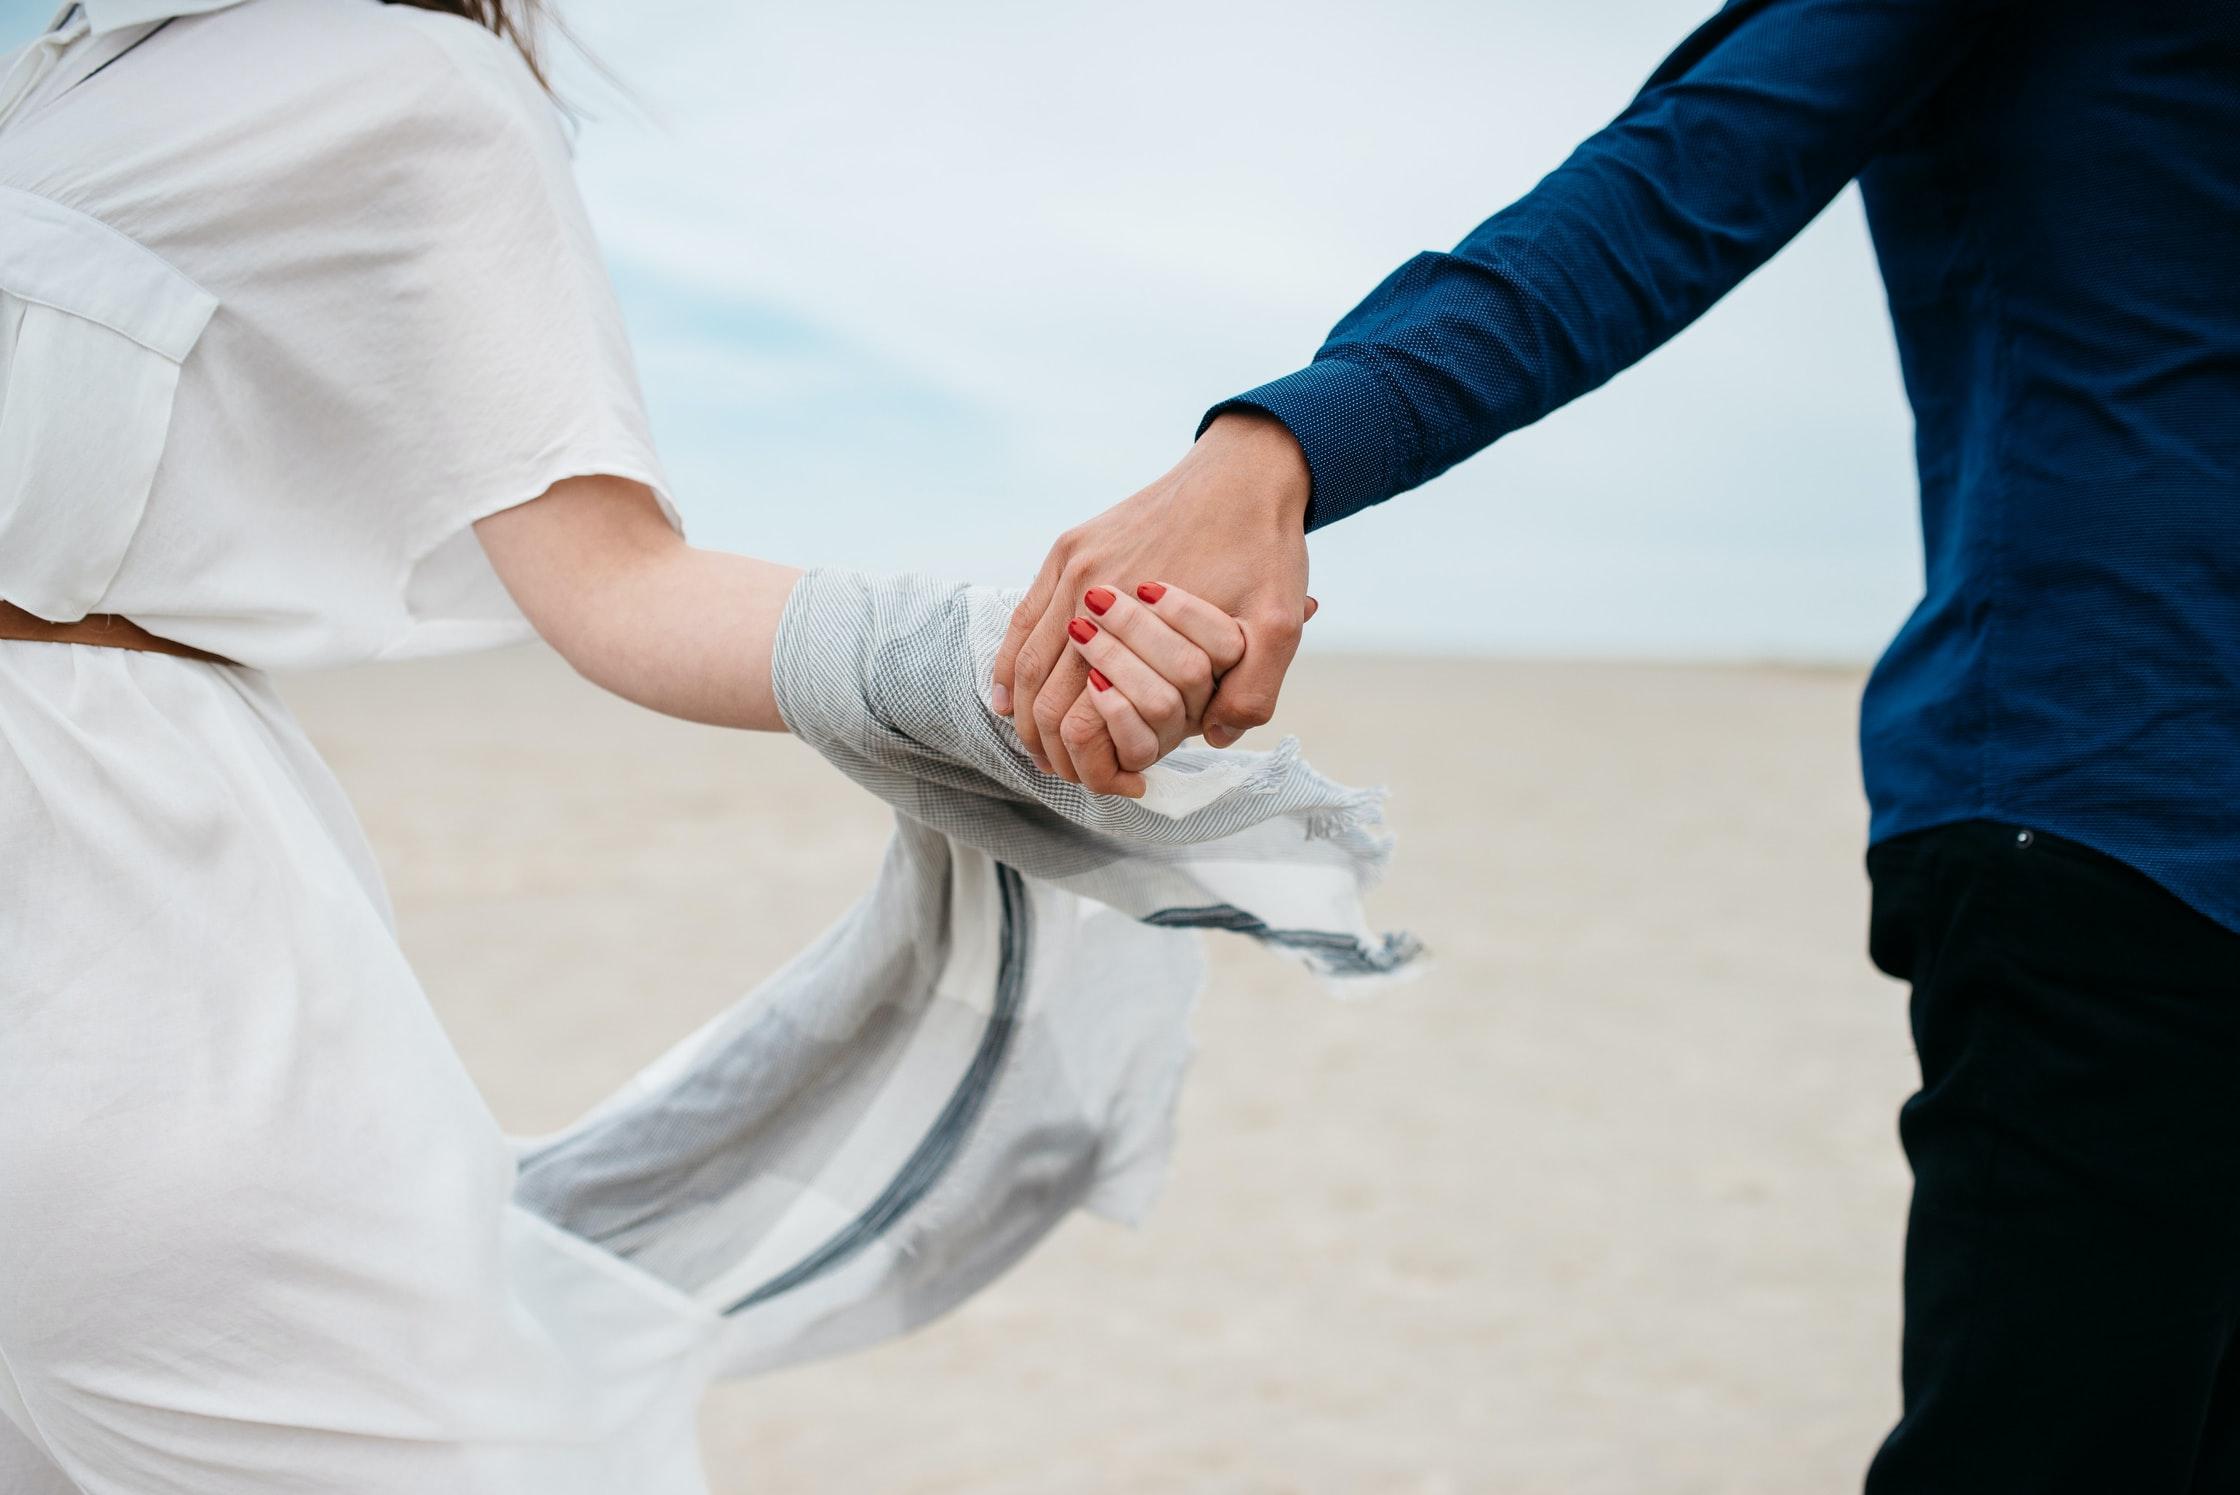 АРИТ запускает онлайн-курс «Азбука отношений»